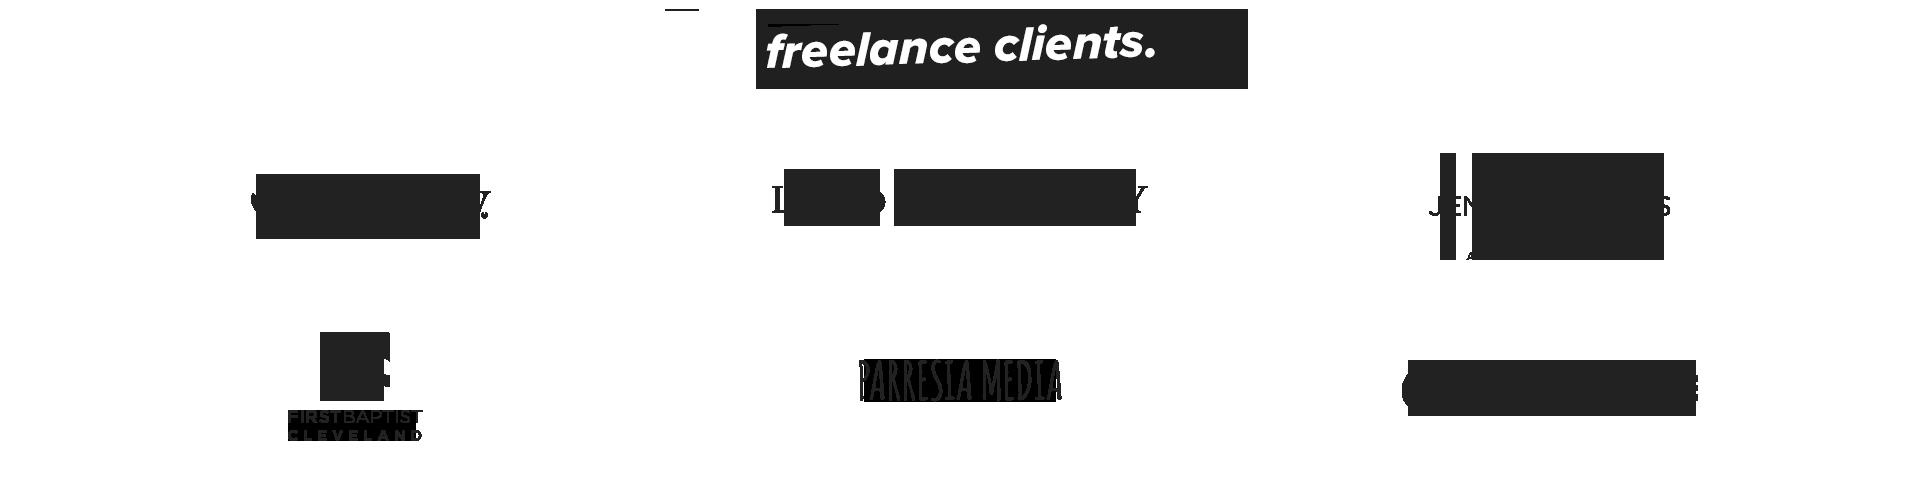 ClientList.png